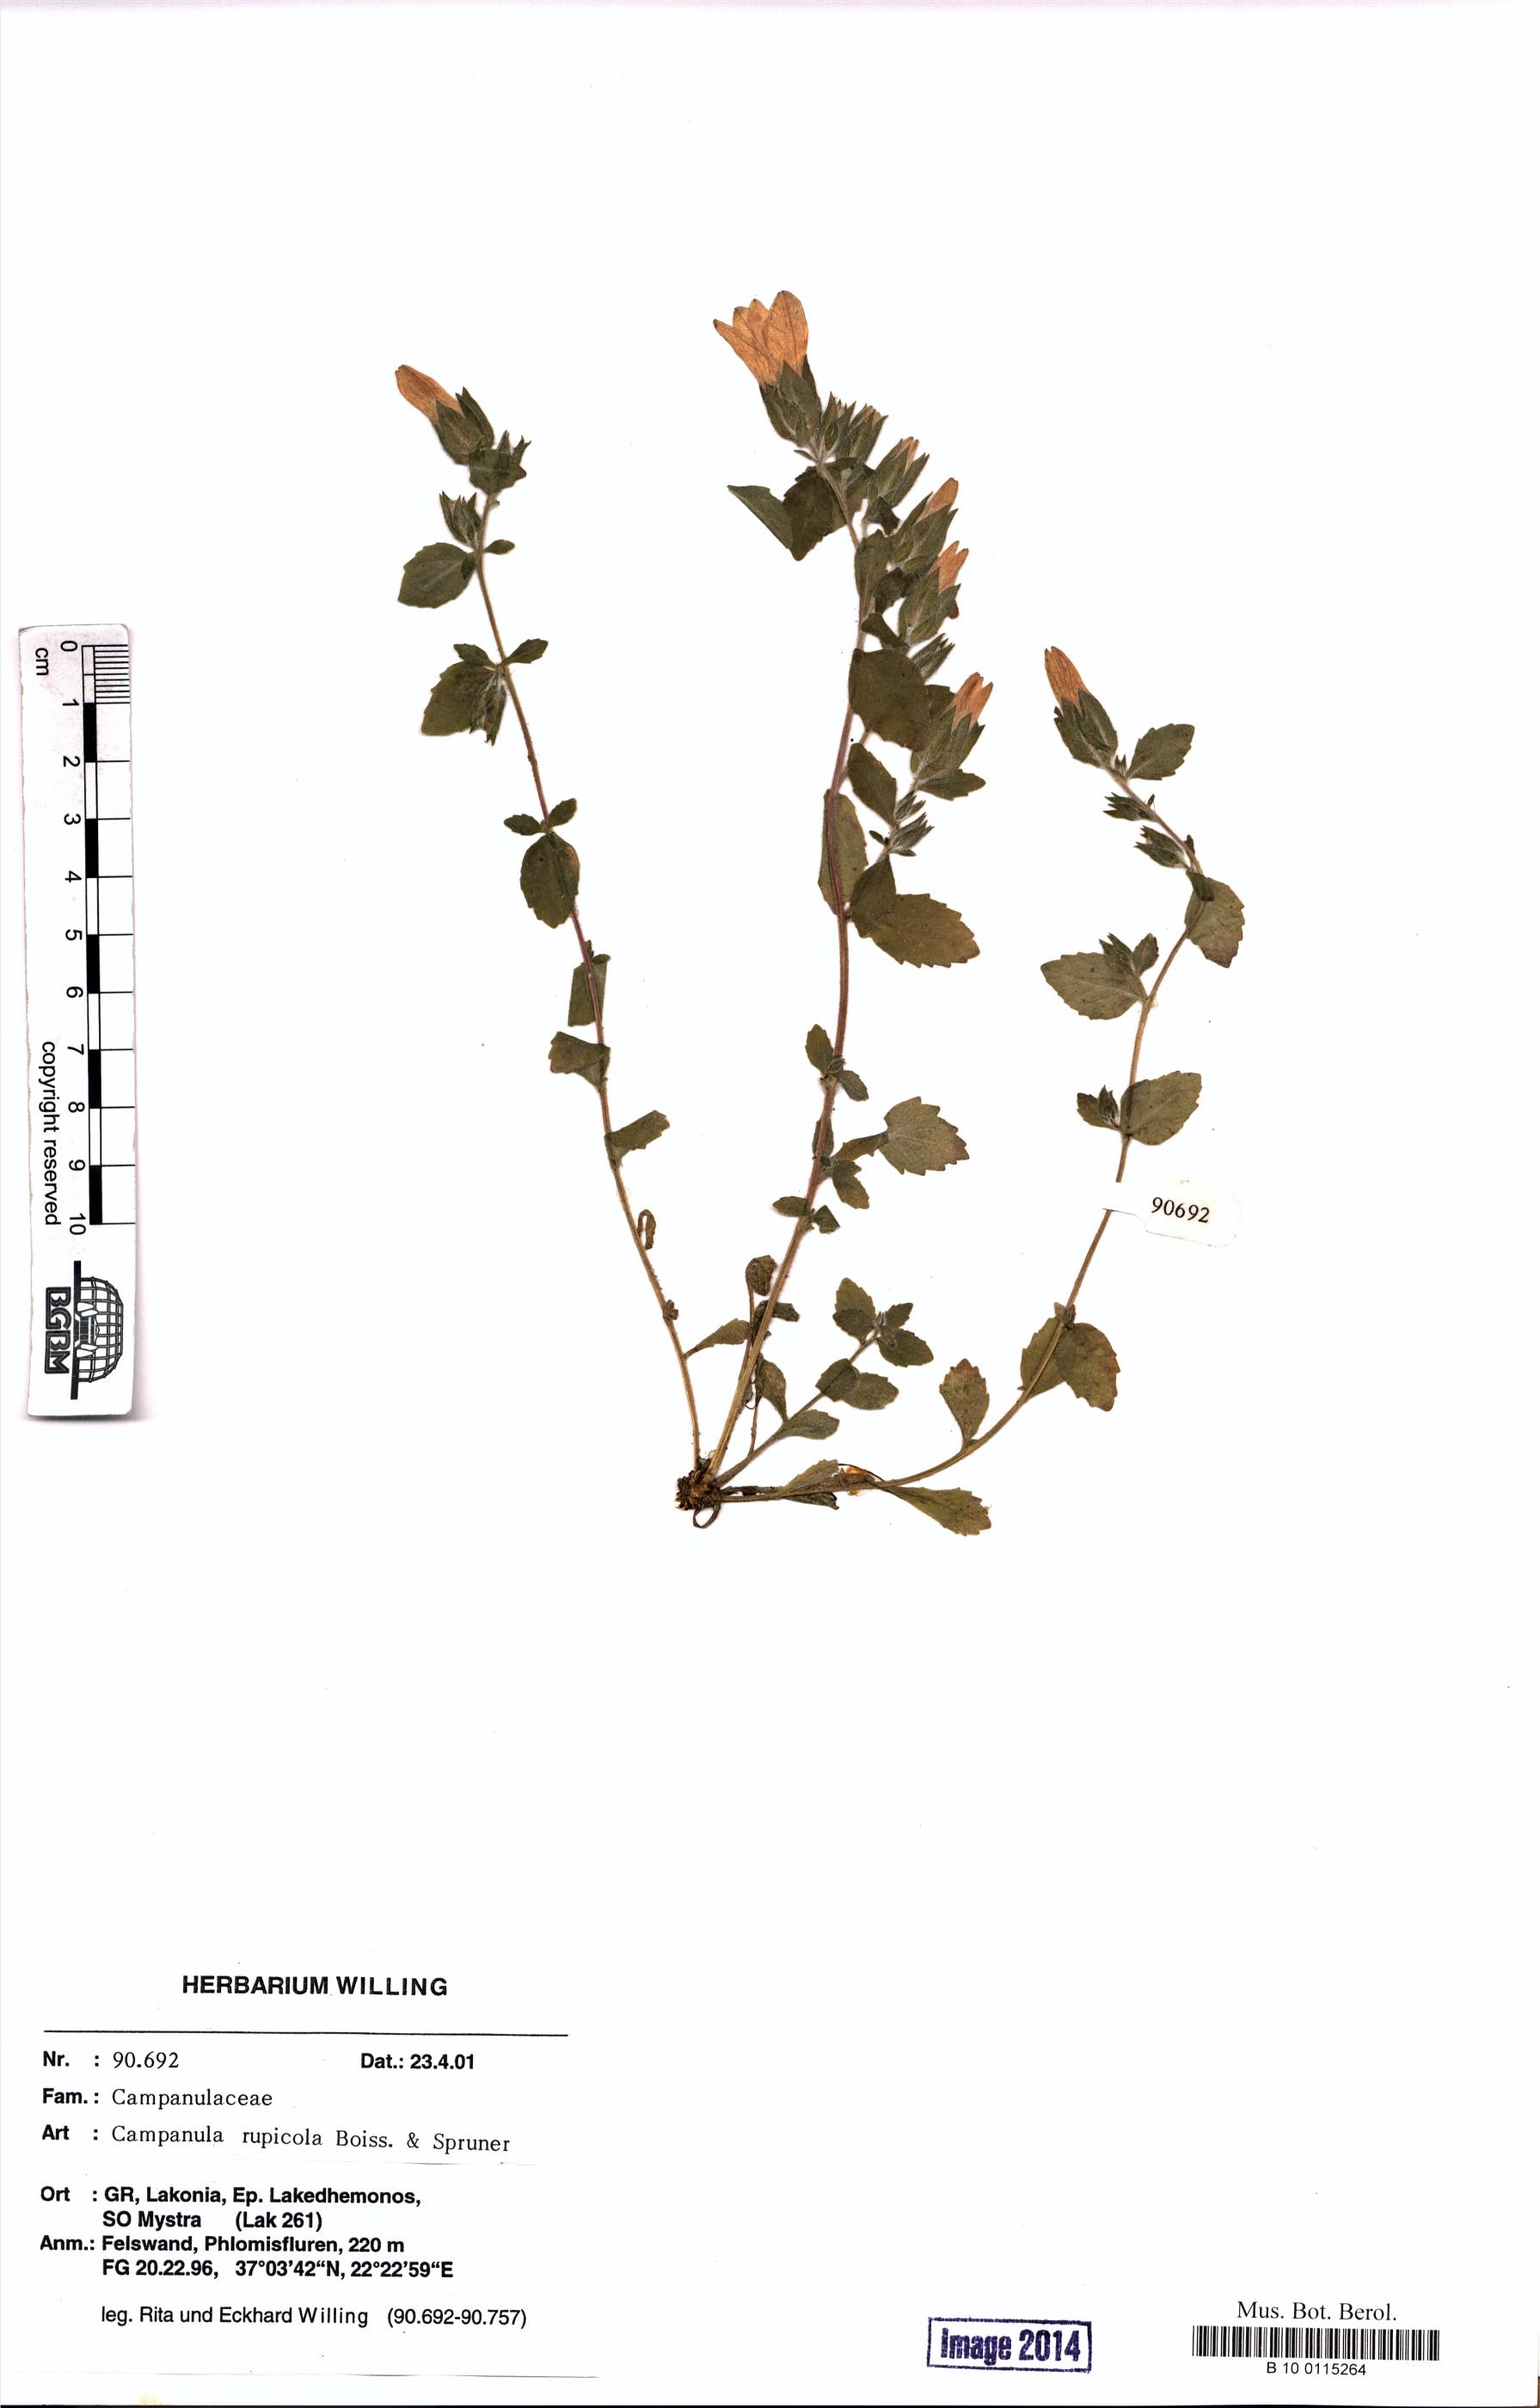 http://ww2.bgbm.org/herbarium/images/B/10/01/15/26/B_10_0115264.jpg